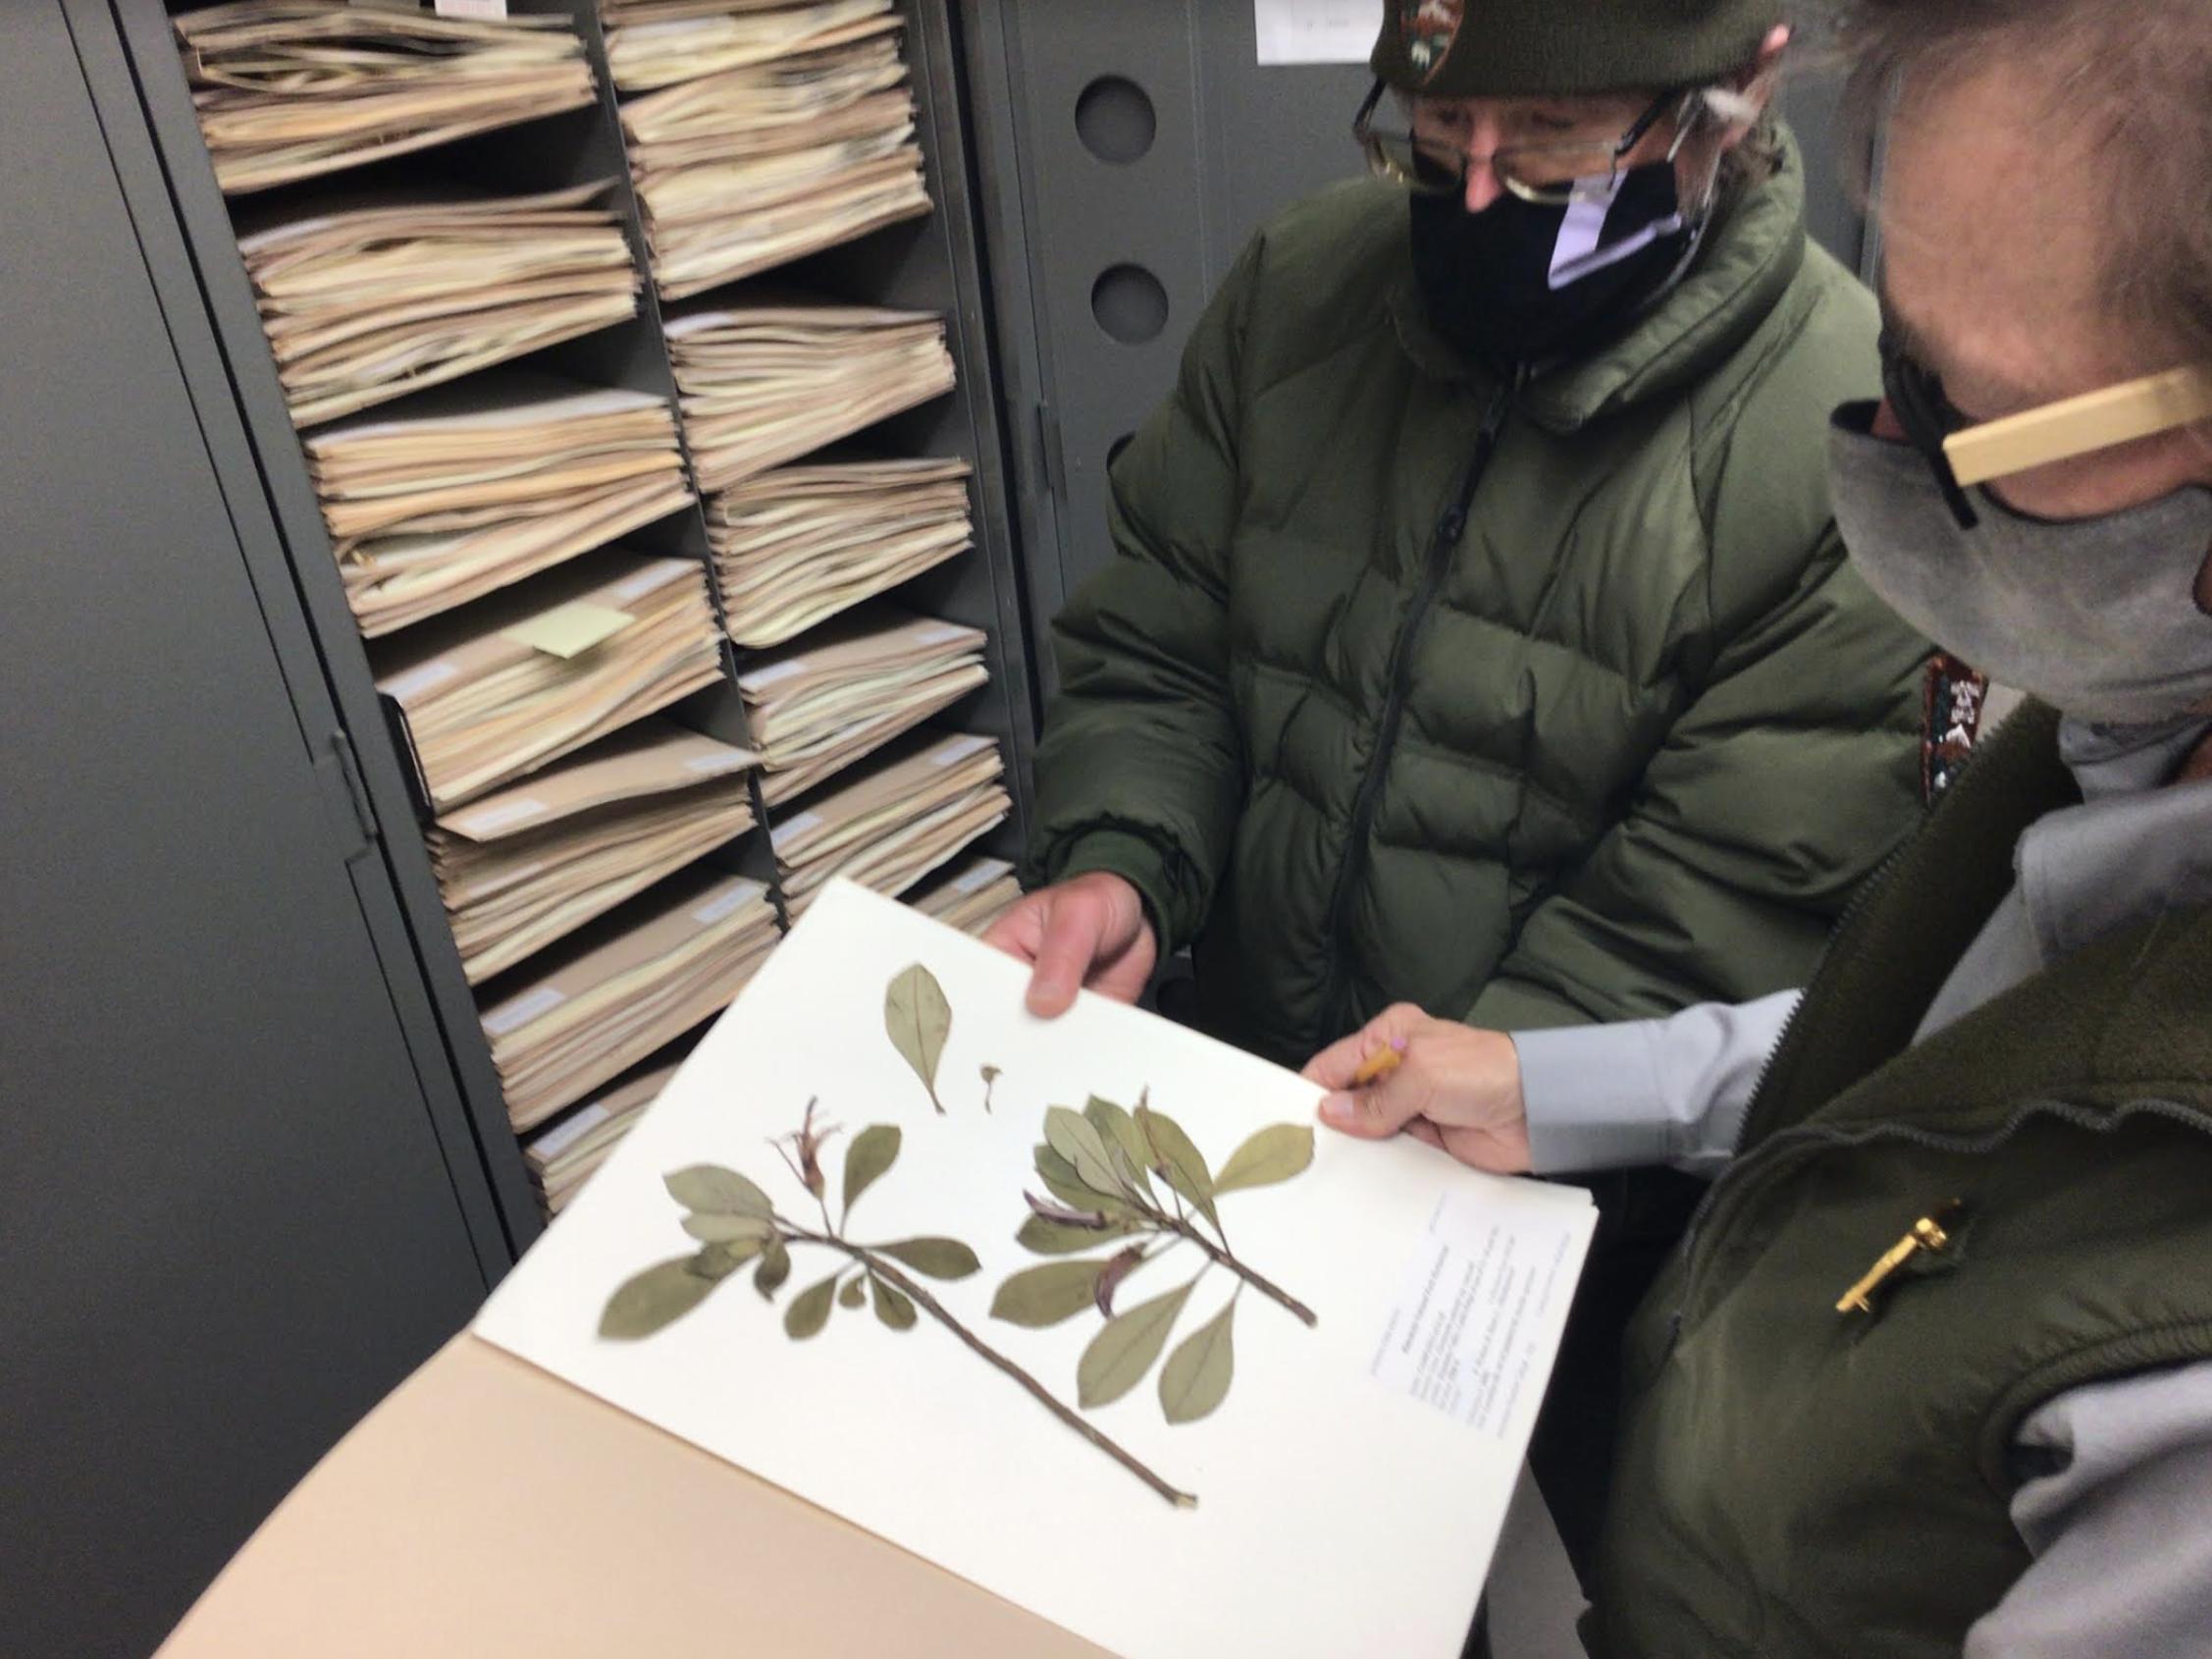 Archiving a Legacy of Plants at Haleakalā National Park